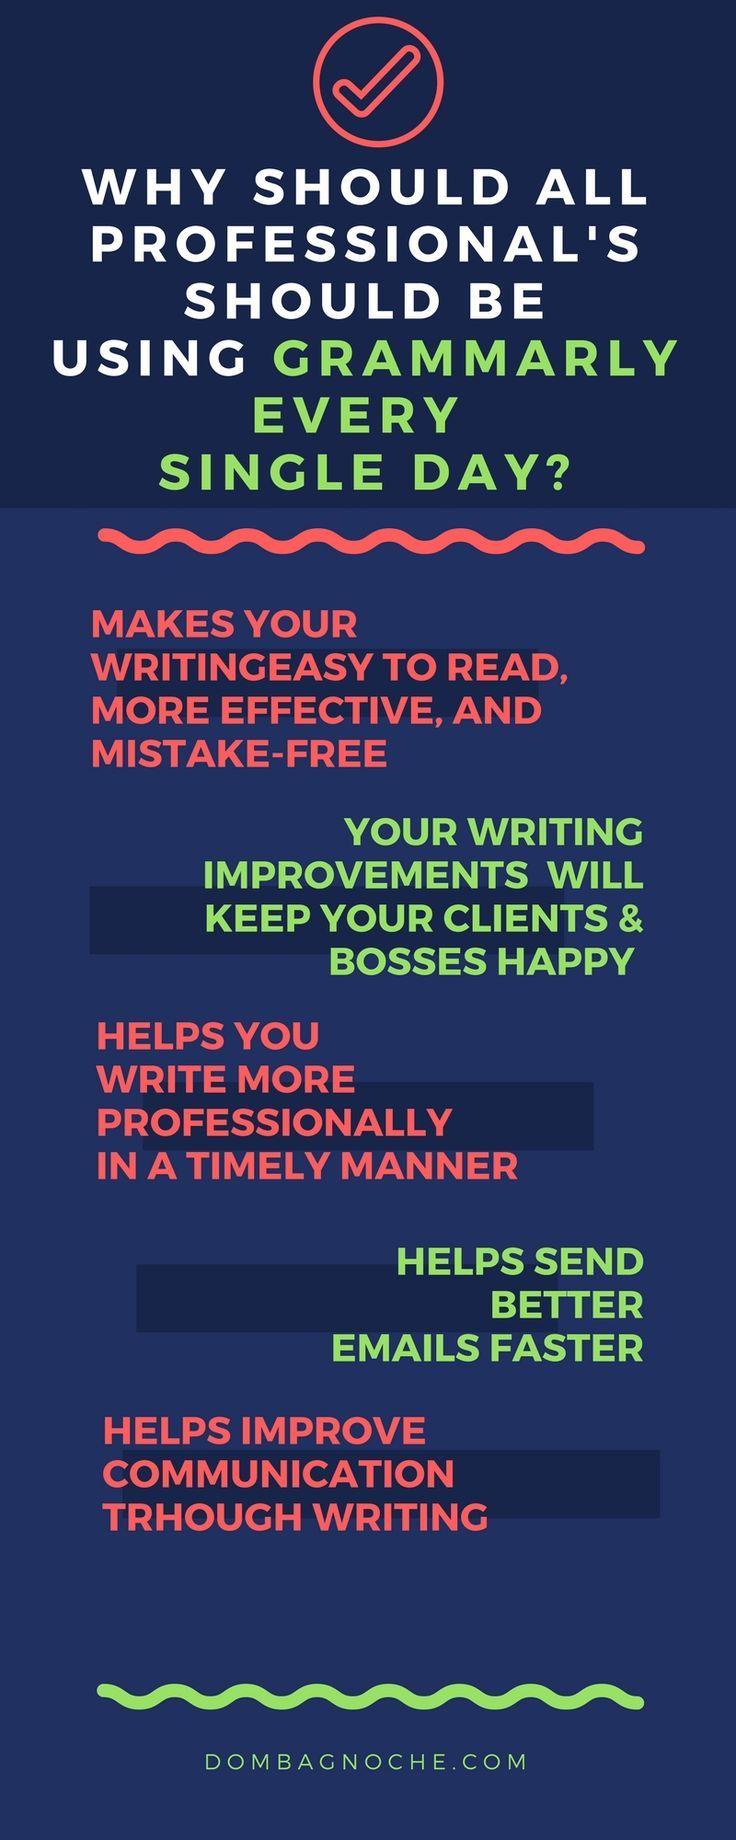 c457bf7144366650c7170e910b0d6d03 term paper an email